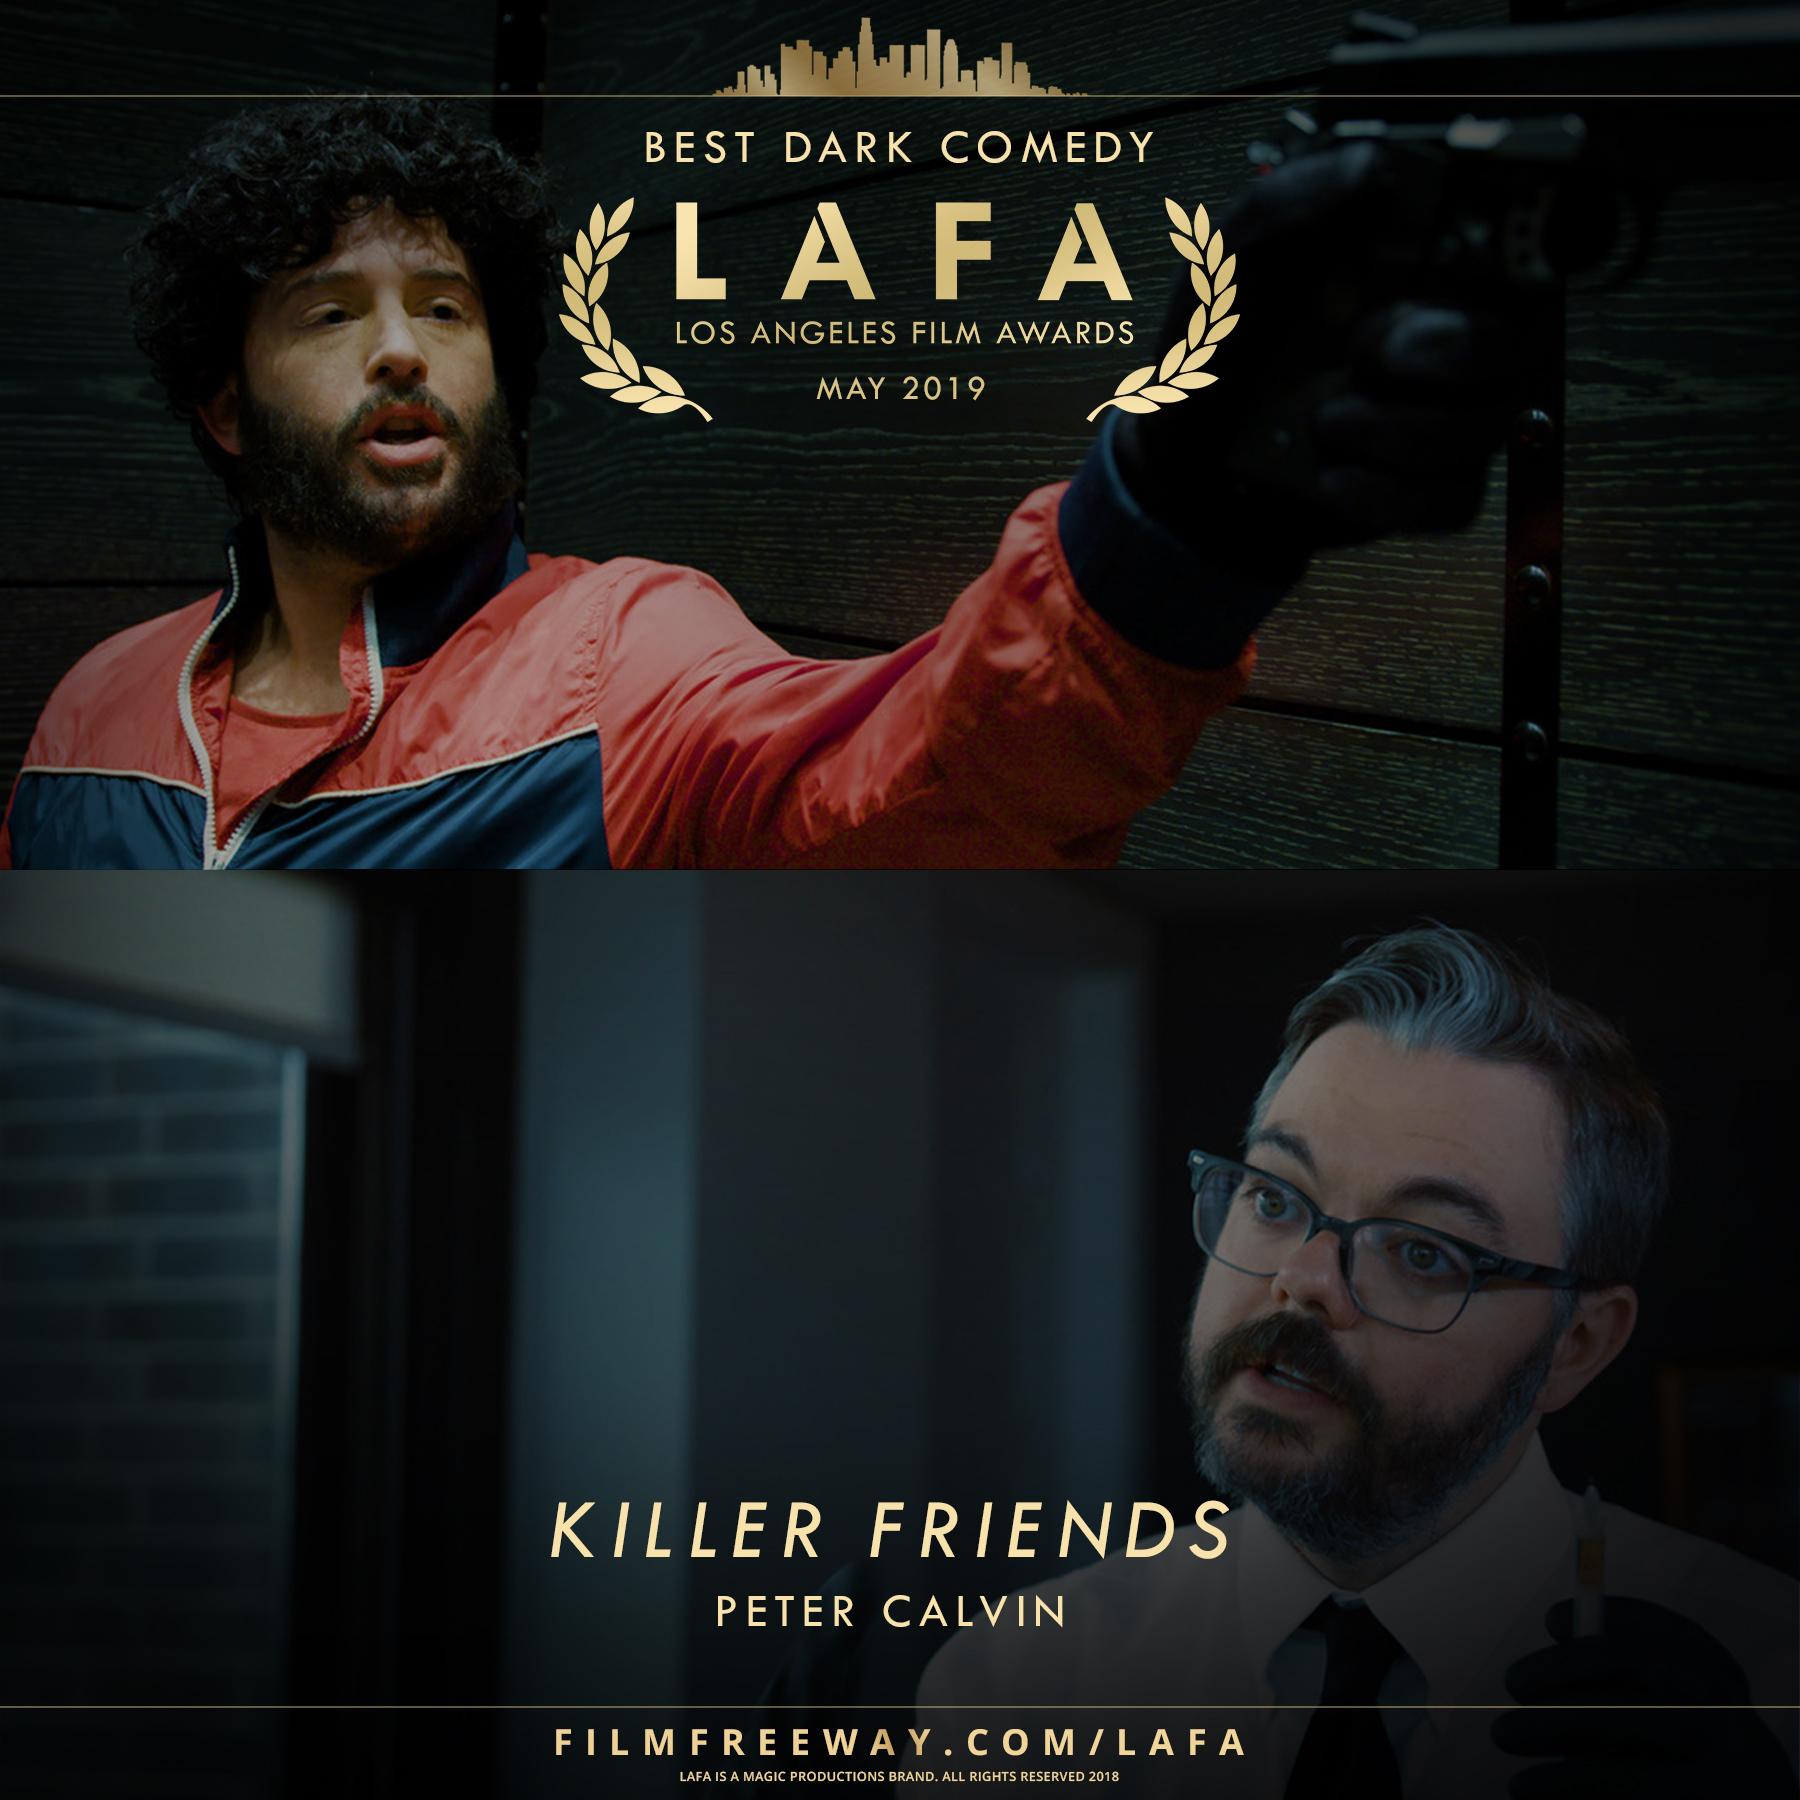 KILLER FRIENDS design